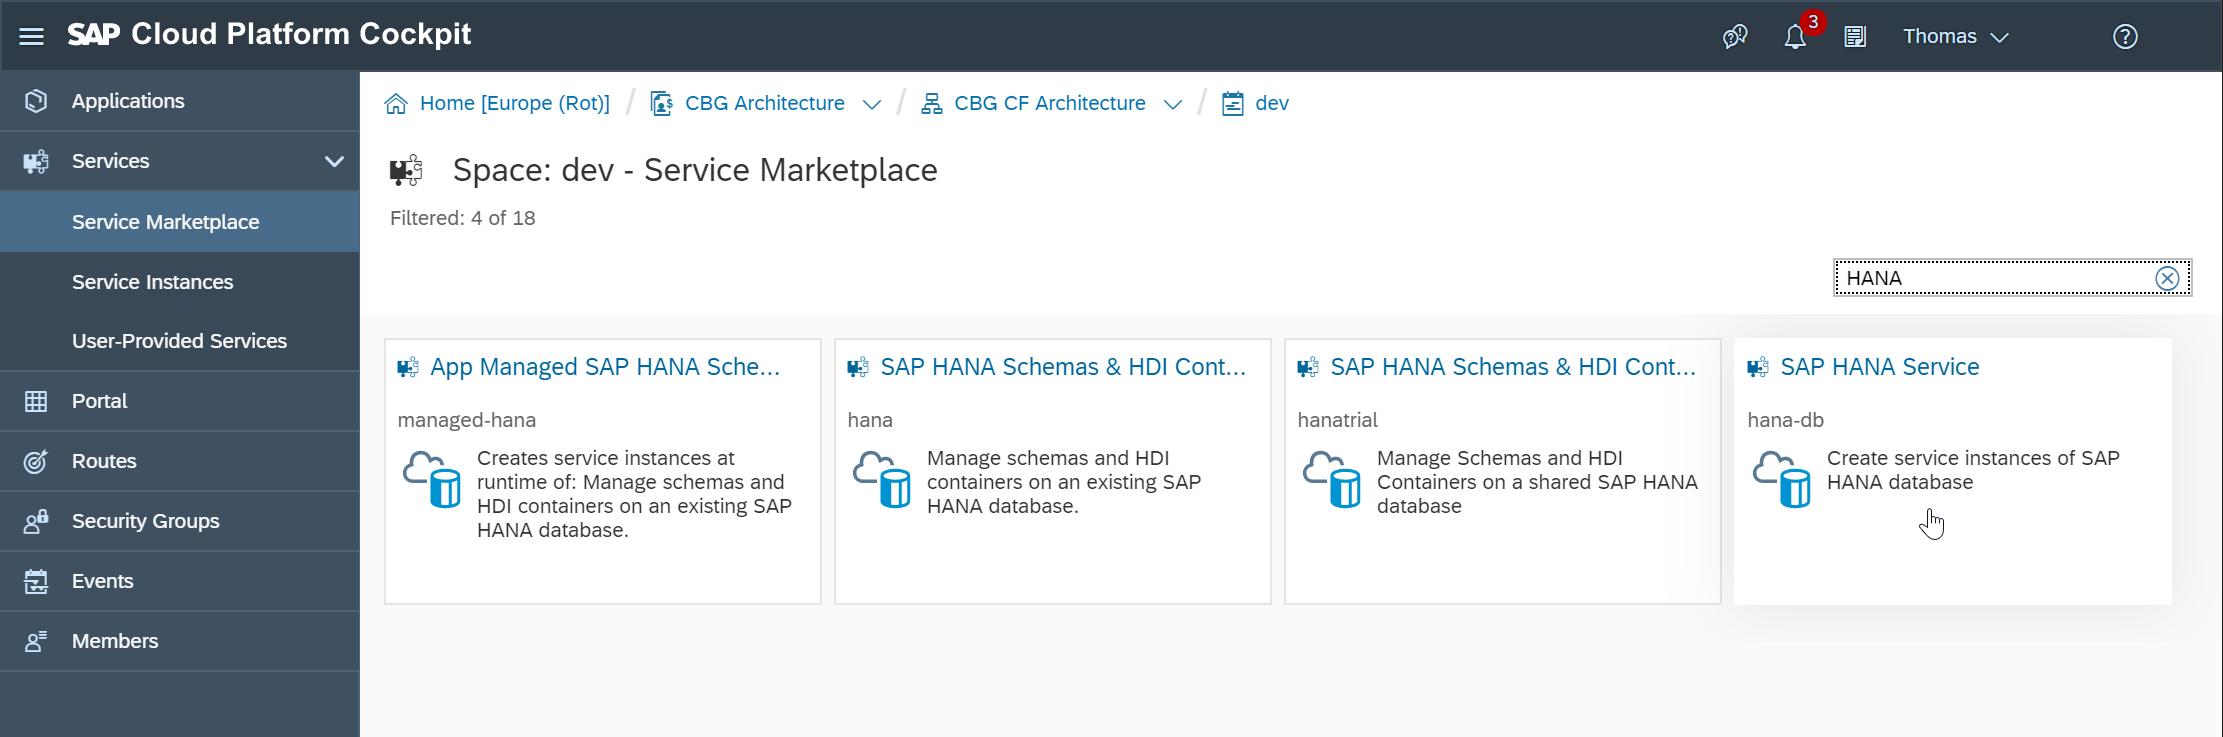 SAP HANA Development from Alternative IDEs | SAP Blogs